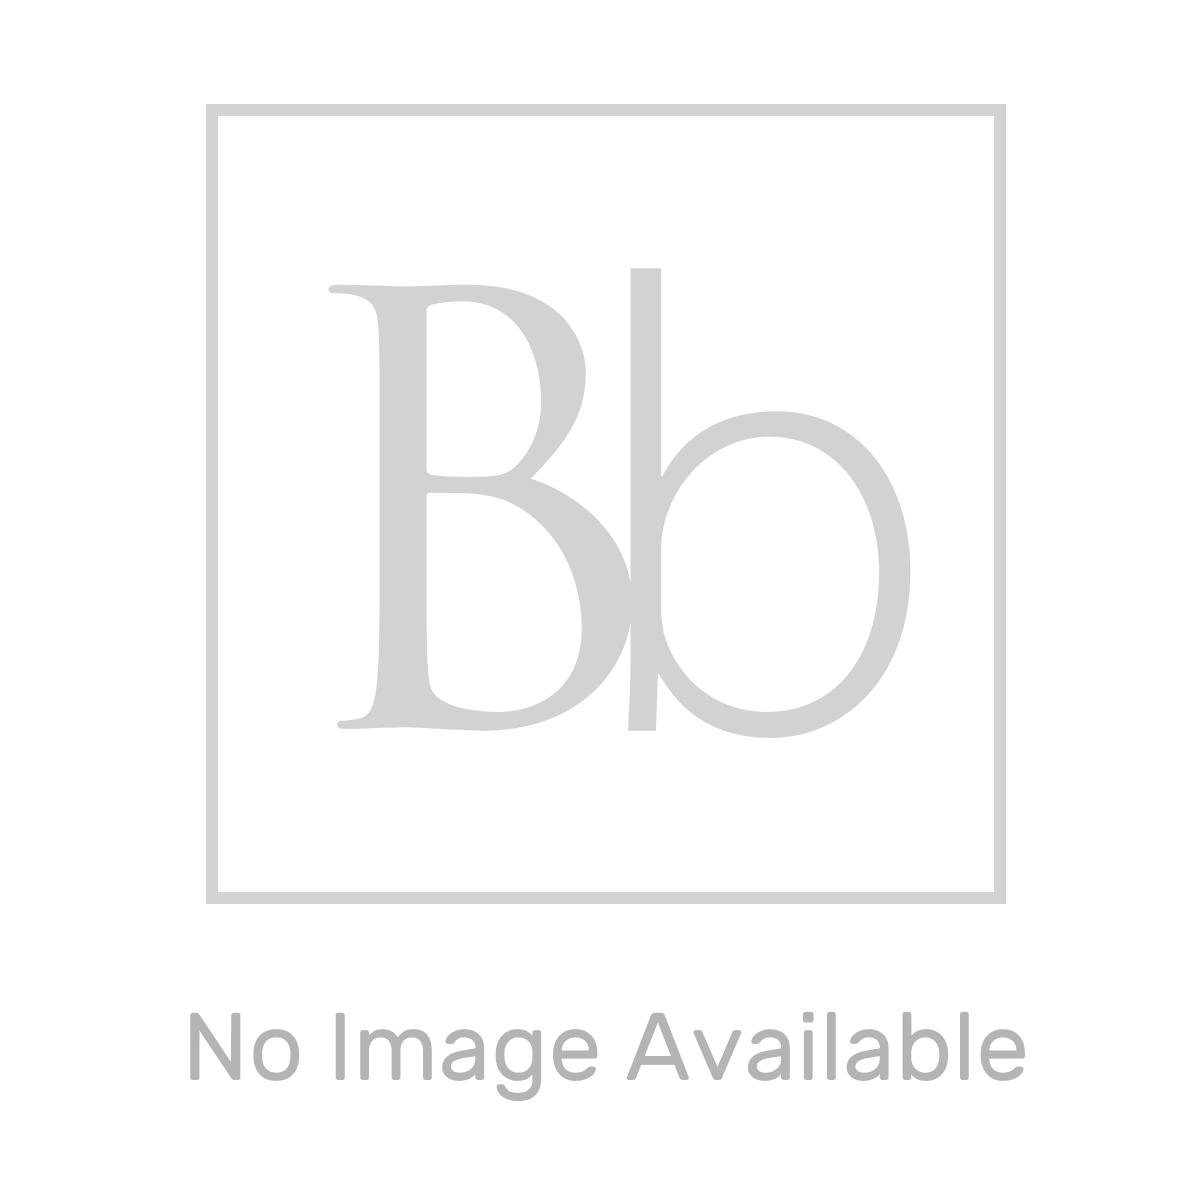 RAK Precious Uni Dark Black Wall Hung Counter Basin 800mm with Brackets Measurements